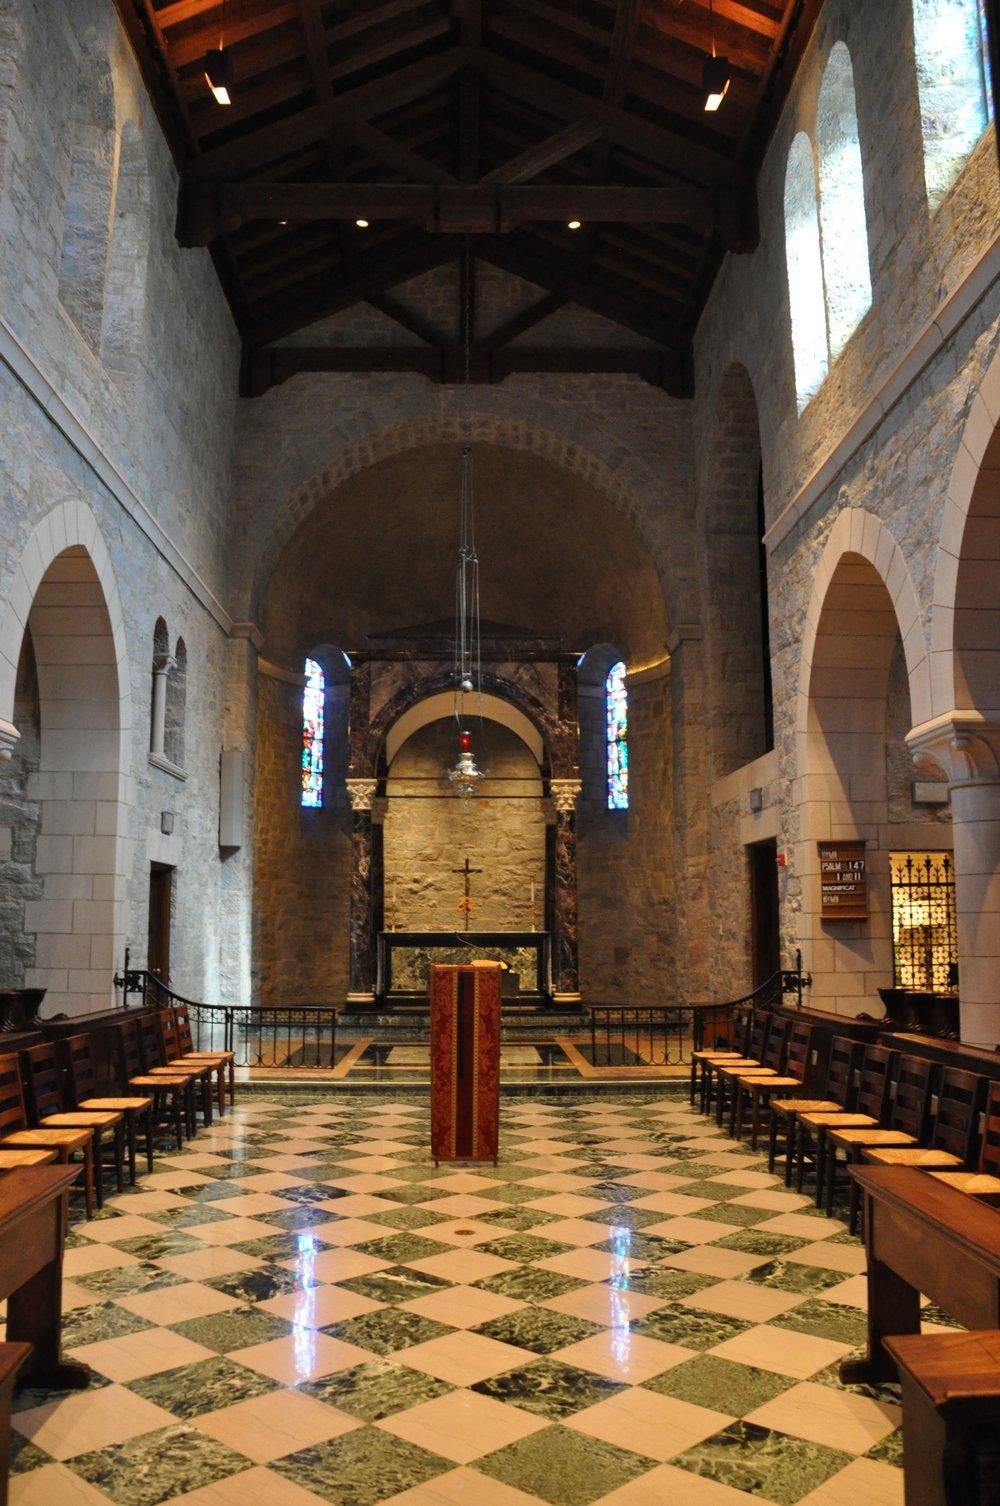 Society of St. John the Evangelist: Cambridge MA